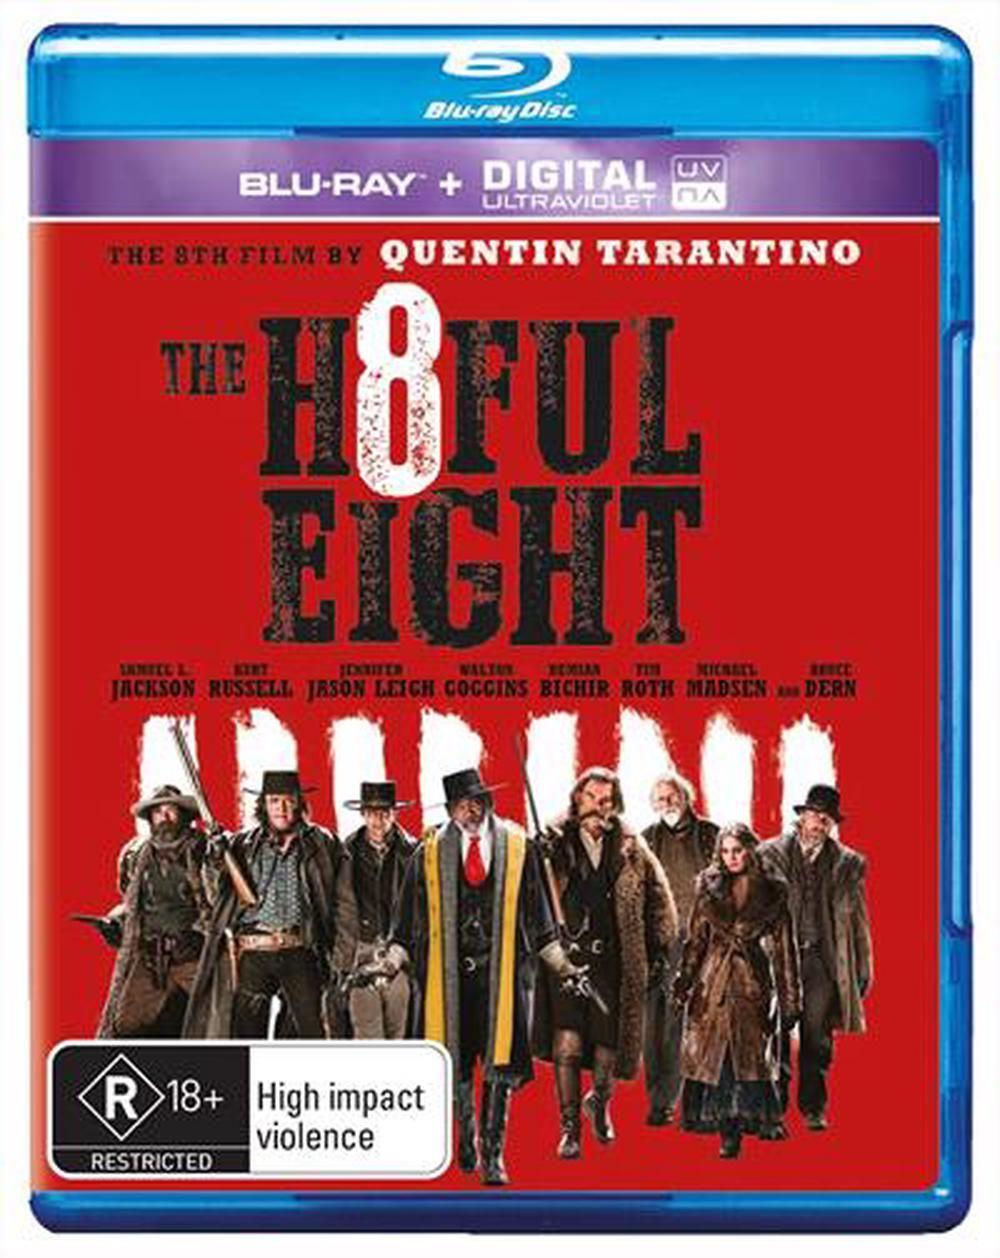 Les Huit Salopards (2015) MULTi VFF 1080p 10bit HDLight BluRay x265 AAC 5 1-MM91